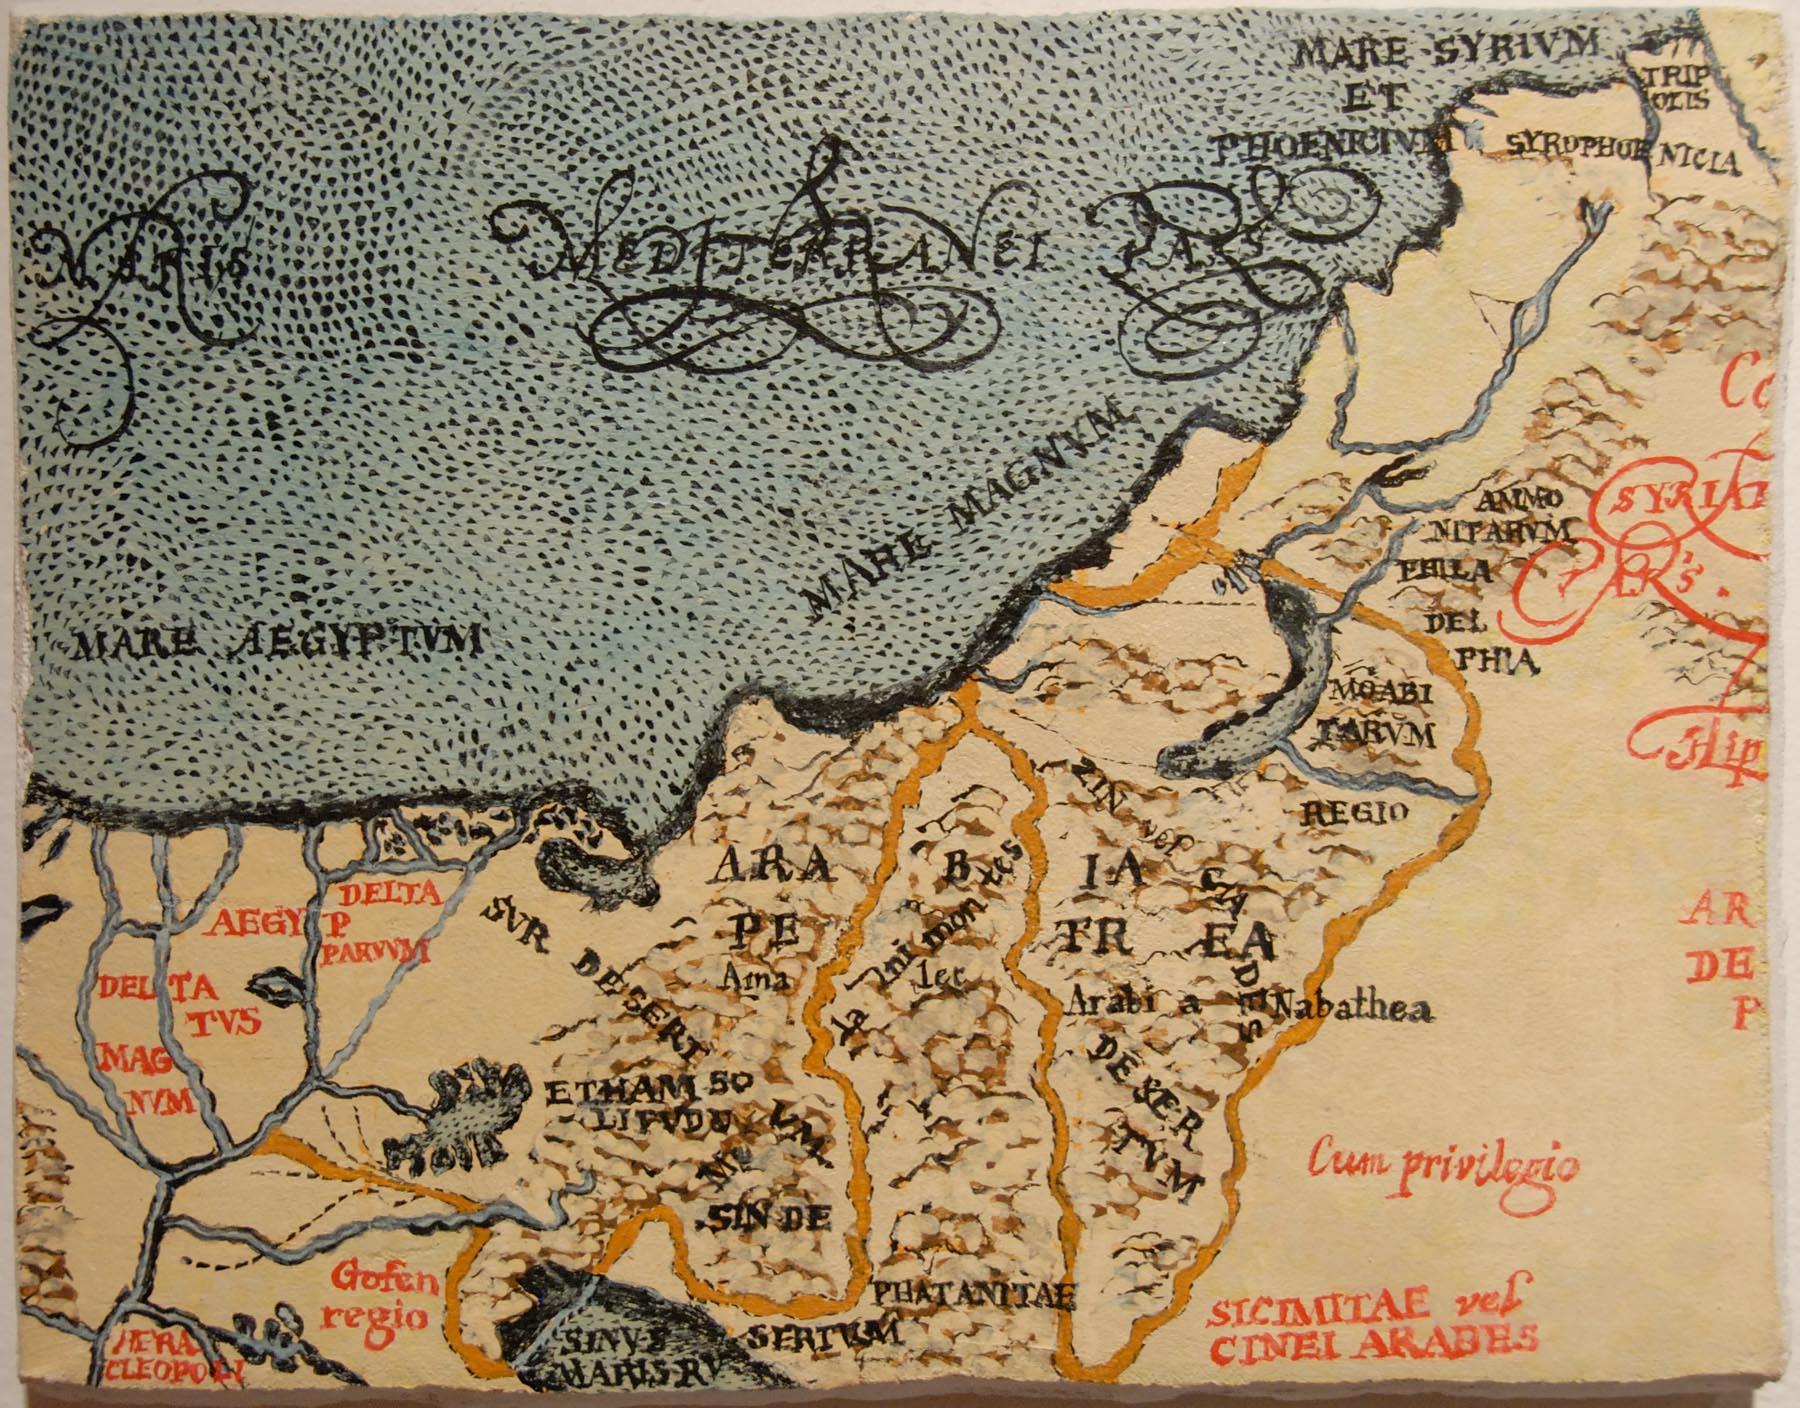 shunter-dcjcc-kozloff-31-knowledge-the-holy-land.jpg